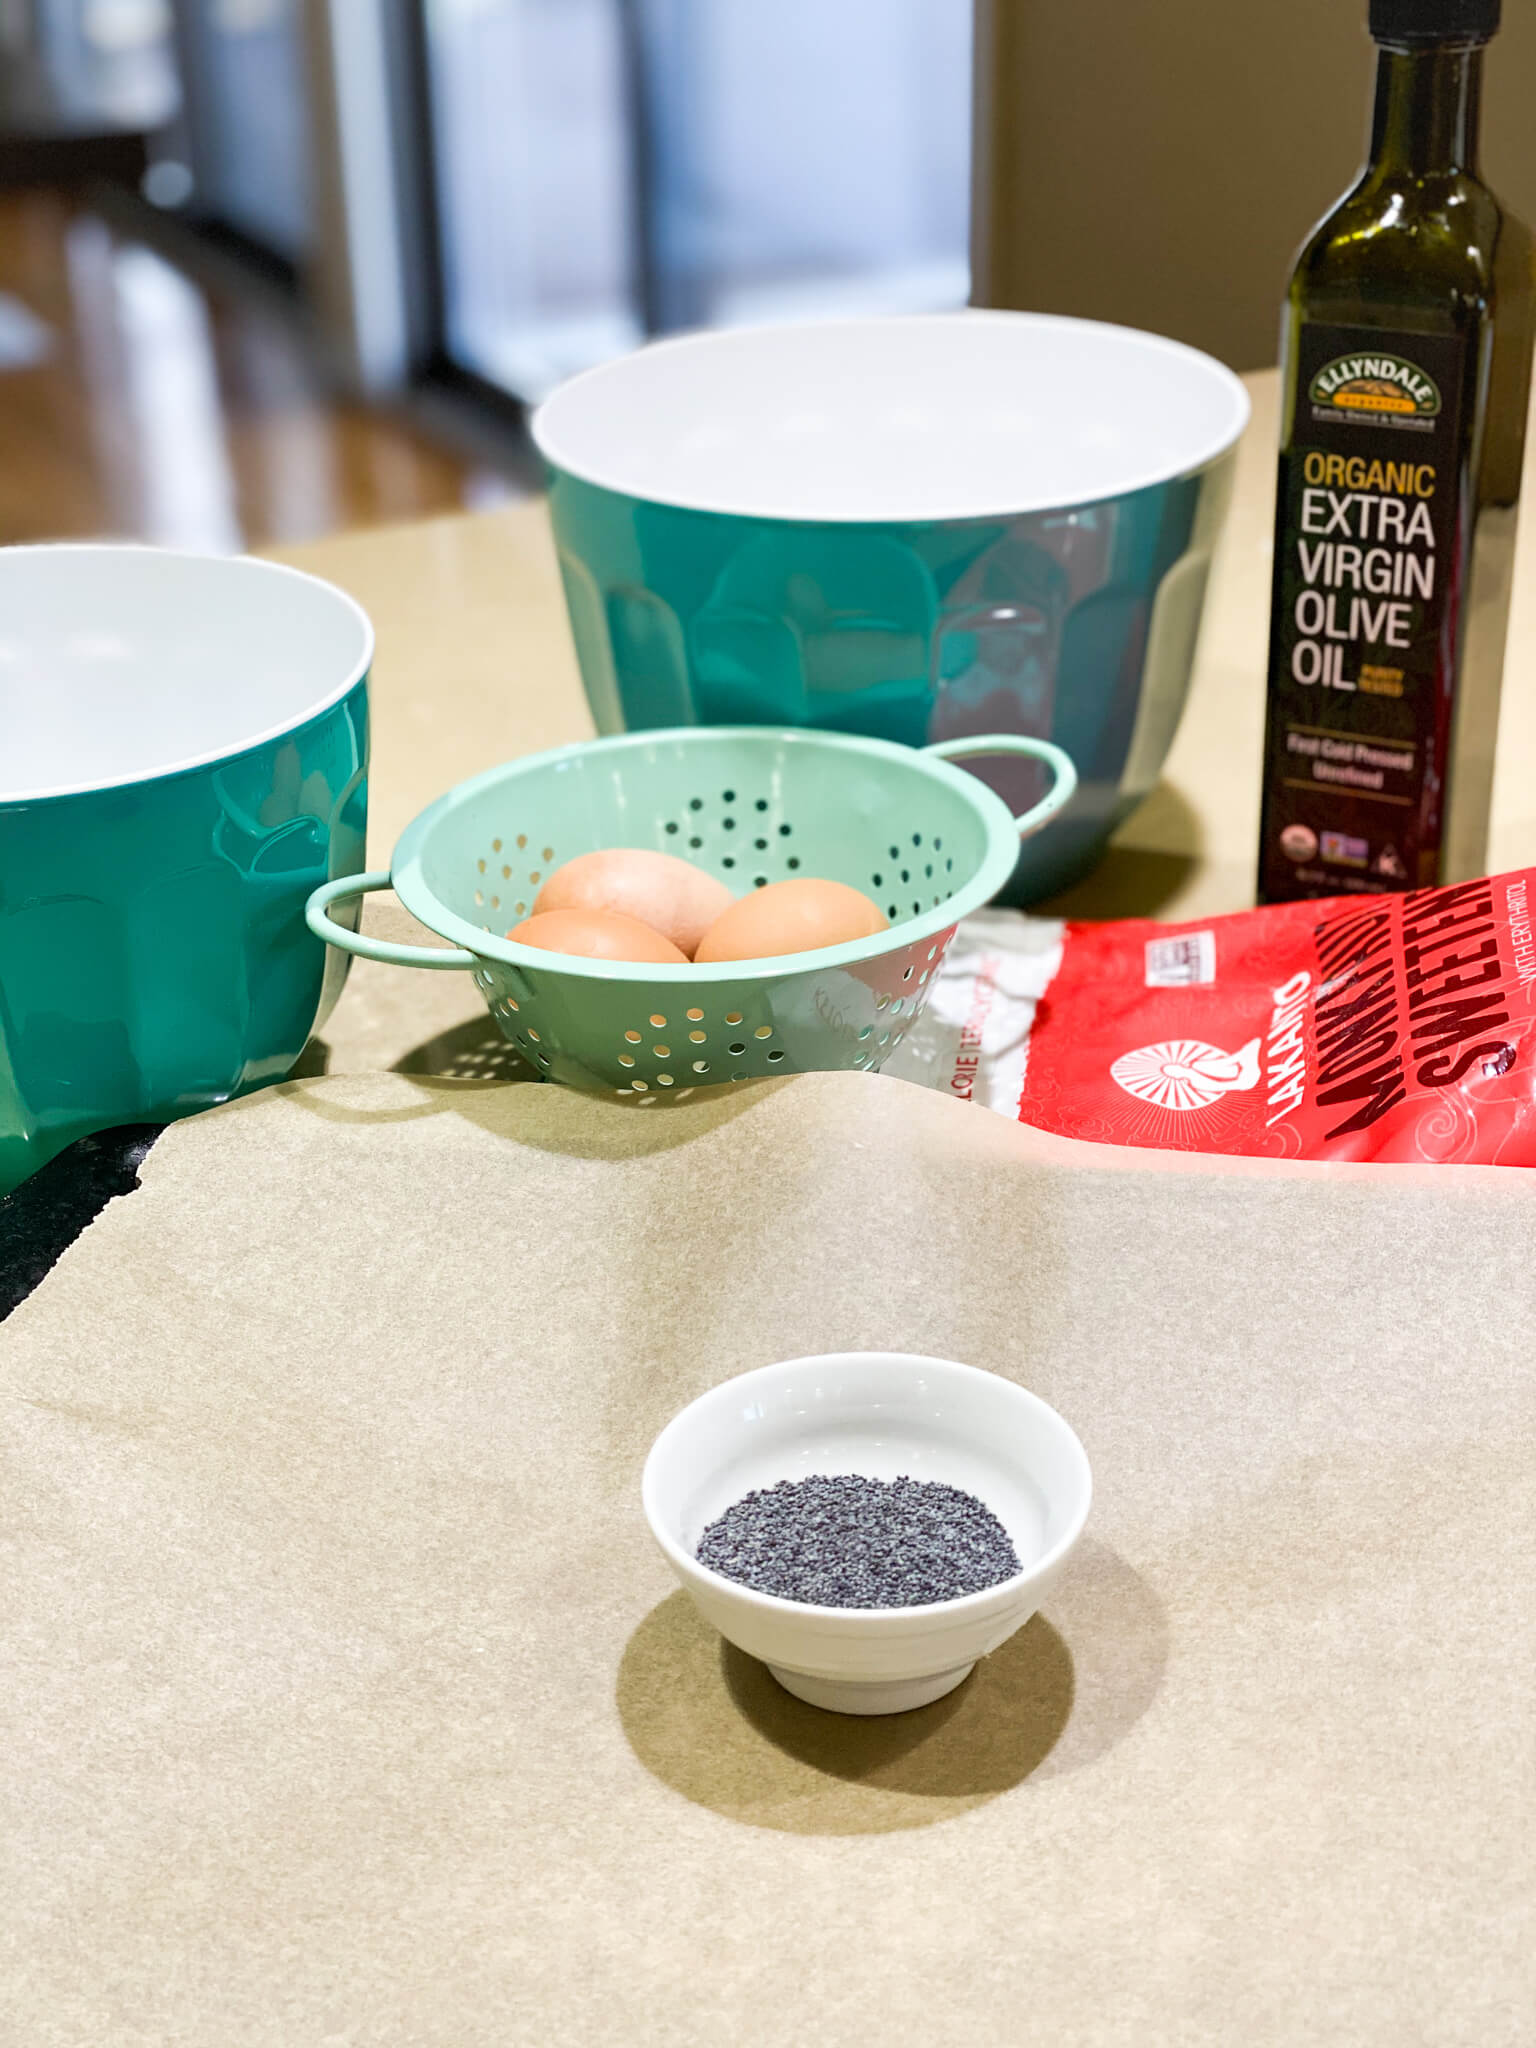 Gluten and Dairy-Free Almond Poppy Seed Sheet Cake Recipe agutsygirl.com #glutenfreerecipe #dairyfreerecipe #glutenfreedairyfree #poppyseed ingredients